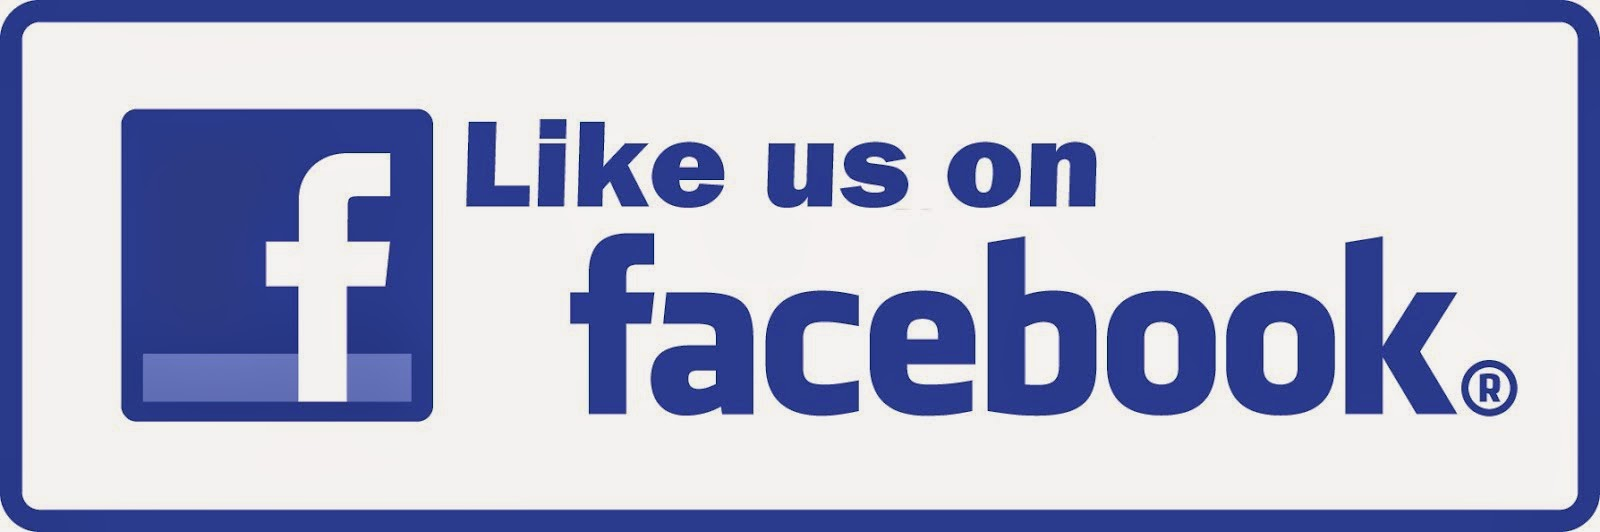 KAUTSAR FOOD FB PAGE